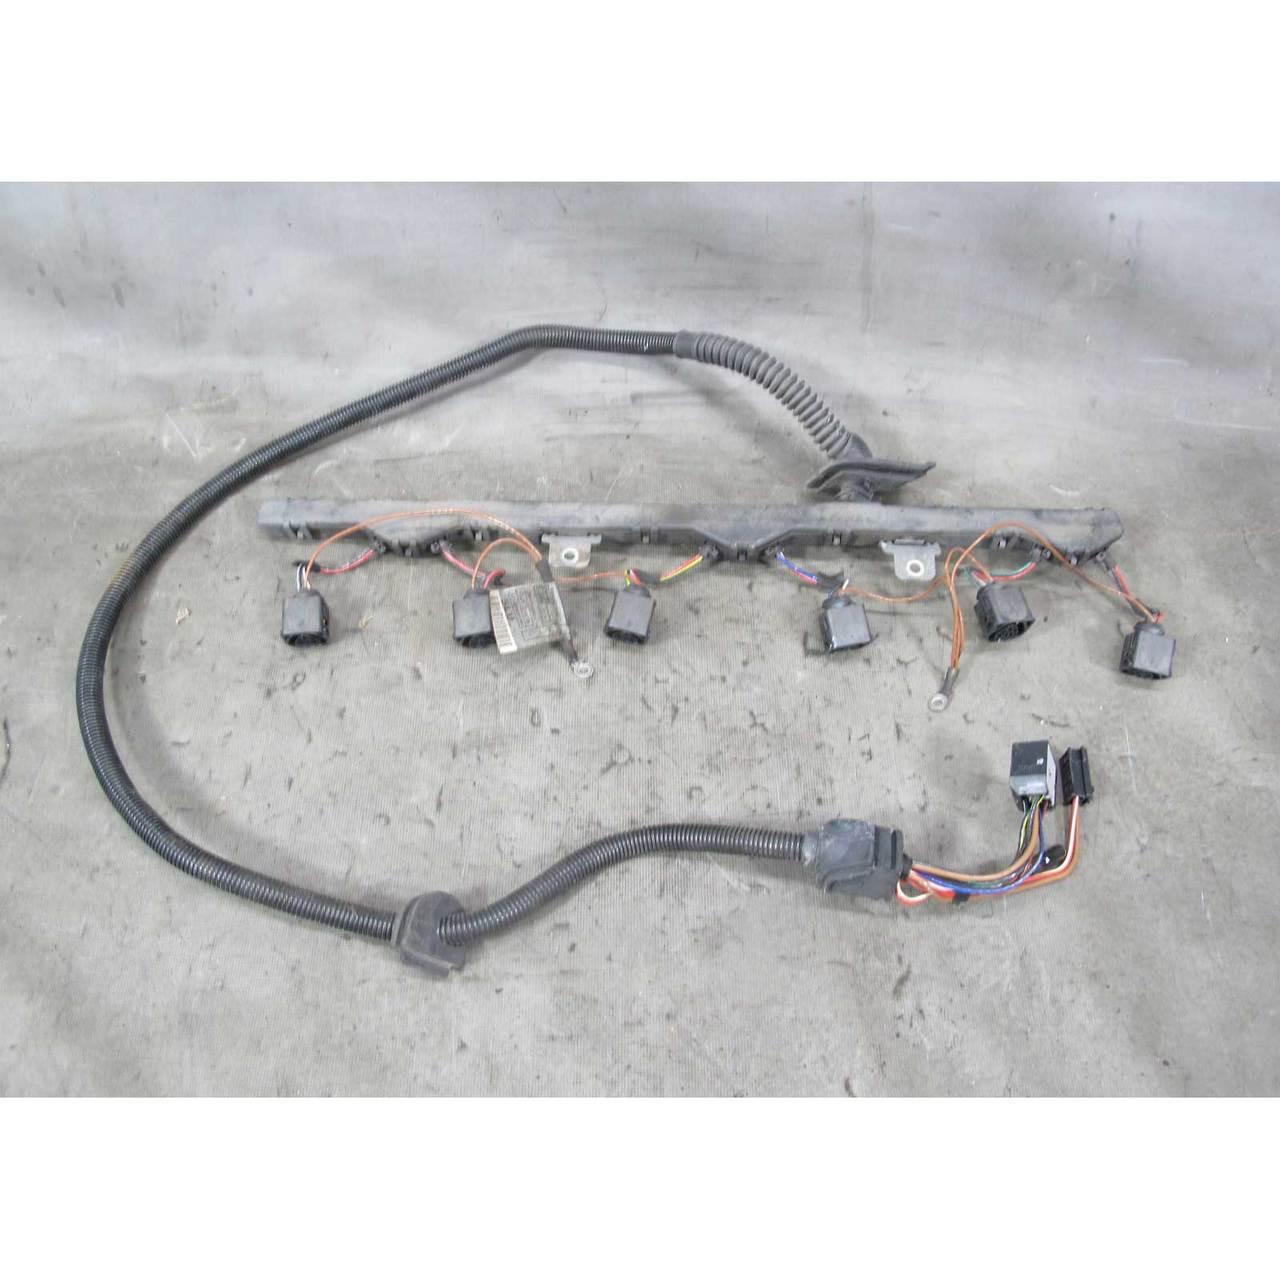 medium resolution of 2003 2006 bmw e46 325i sulev m56 2 5l engine ignition coil wiring harness oem